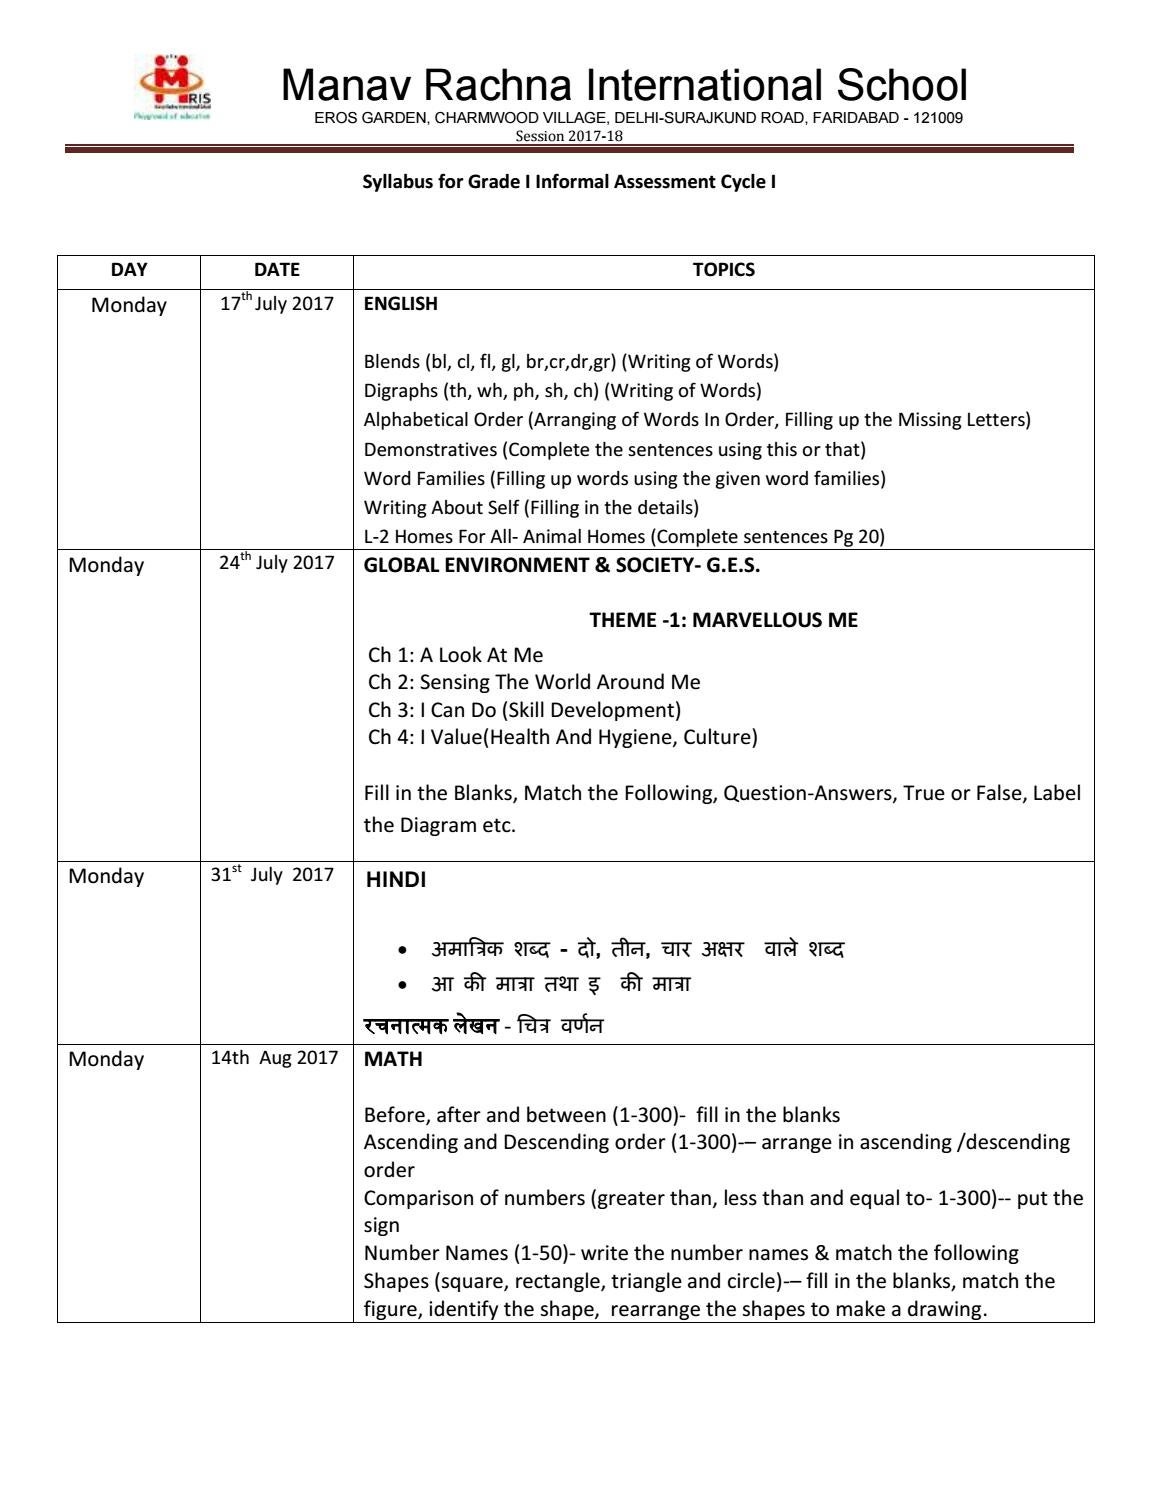 grade-i-informal-assessment-syllabus by MRIS - issuu